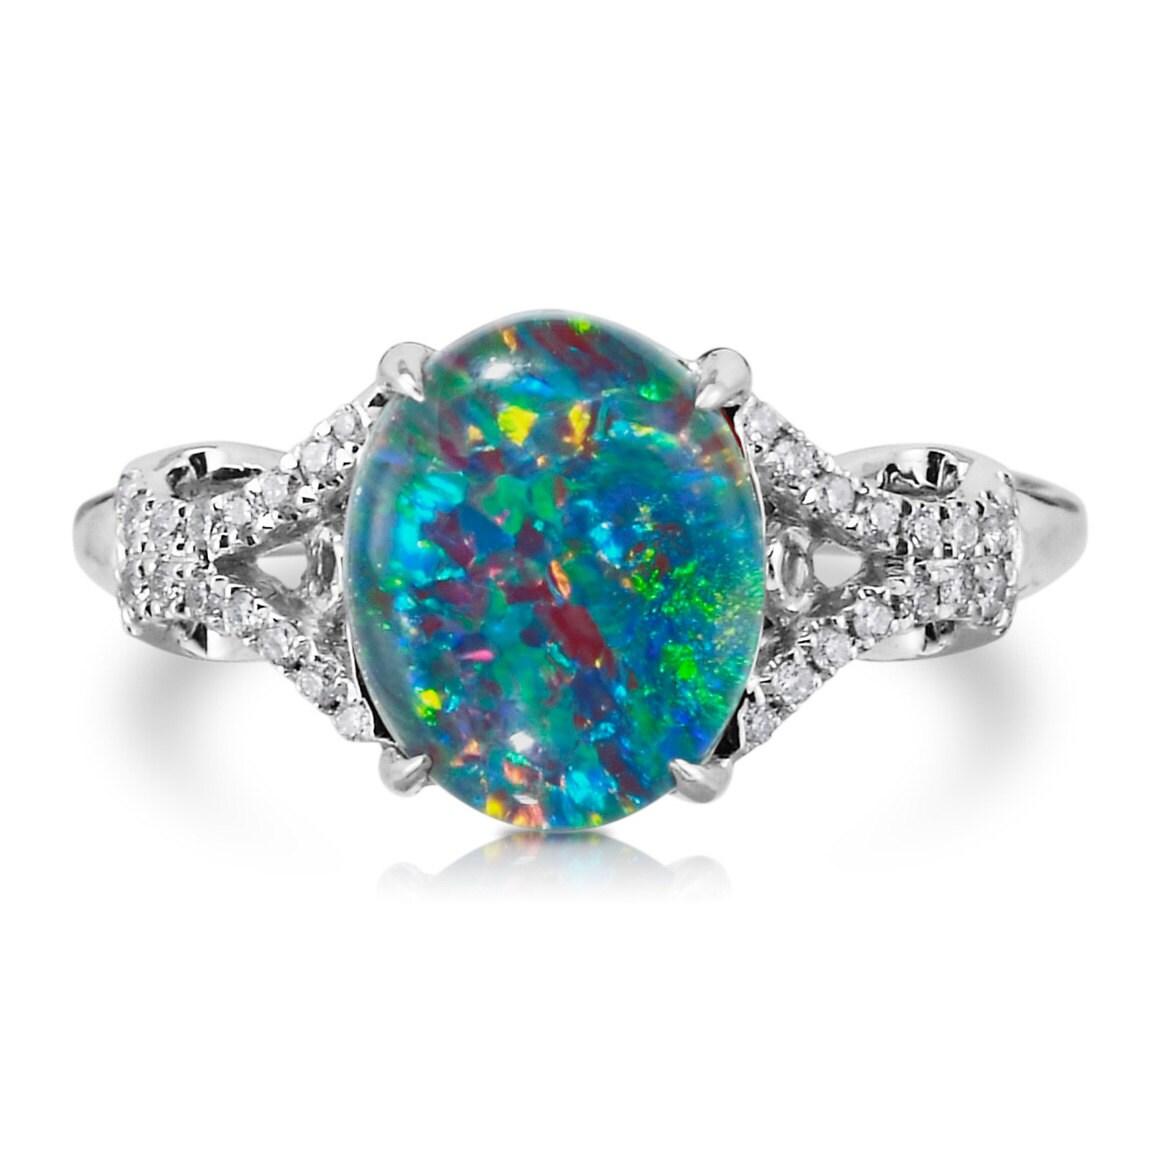 Natural Opal Ring 18k White Gold & 12ct Genuine Diamonds RARE